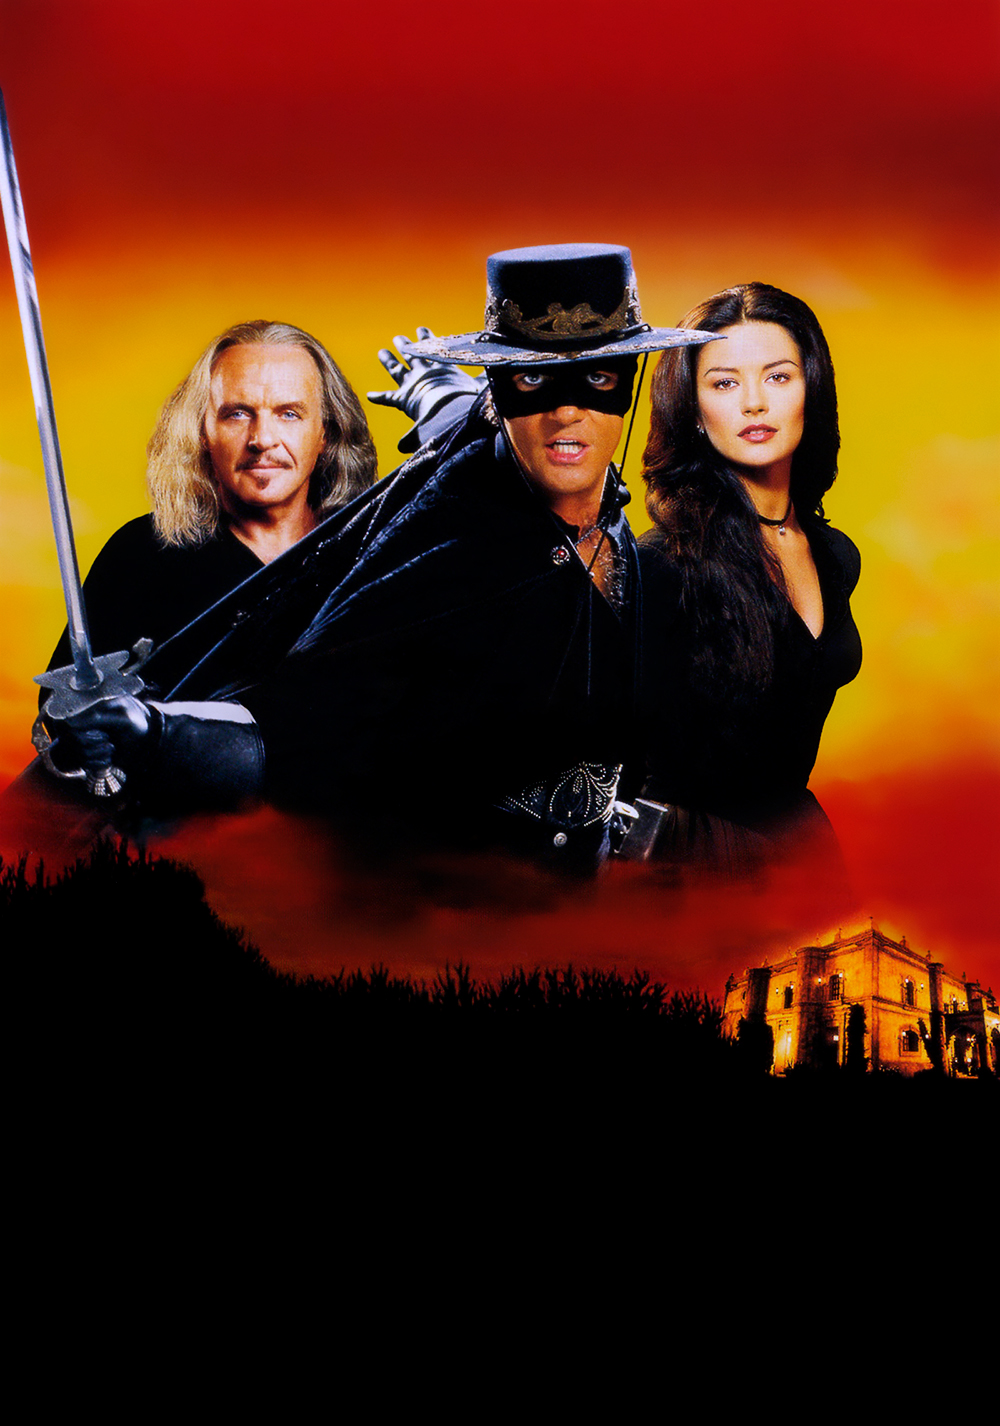 Antonio Banderas, Anthony Hopkins y Catherine Zeta-Jones en The Mask of Zorro (1998). Imagen: fanart.tv